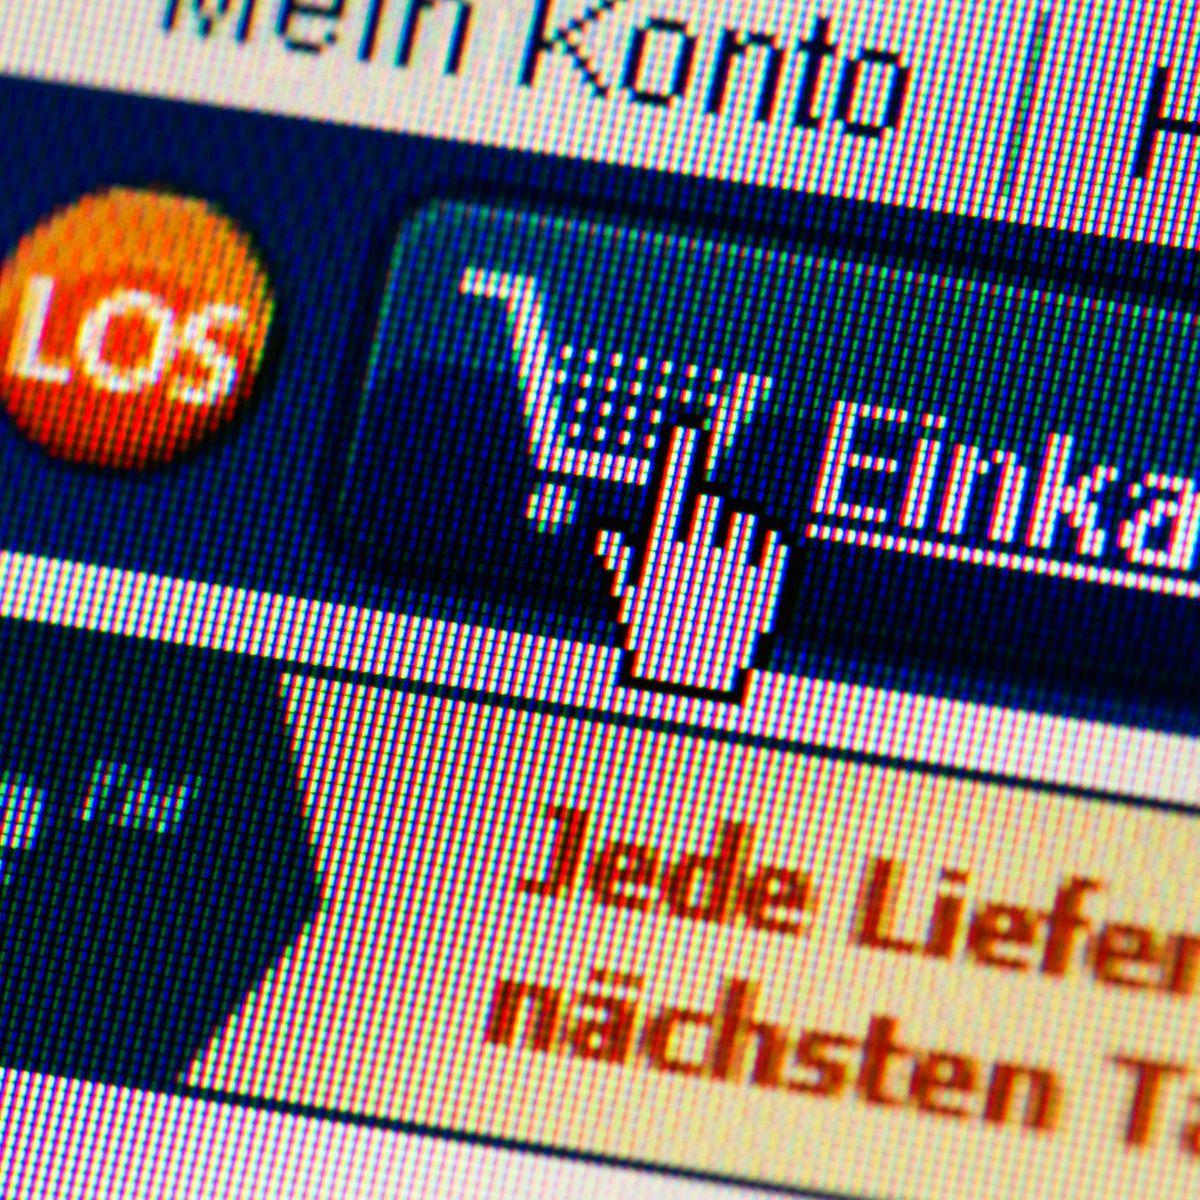 Brexit Zoll Auf Retouren Macht Online Handel Teurer Manager Magazin